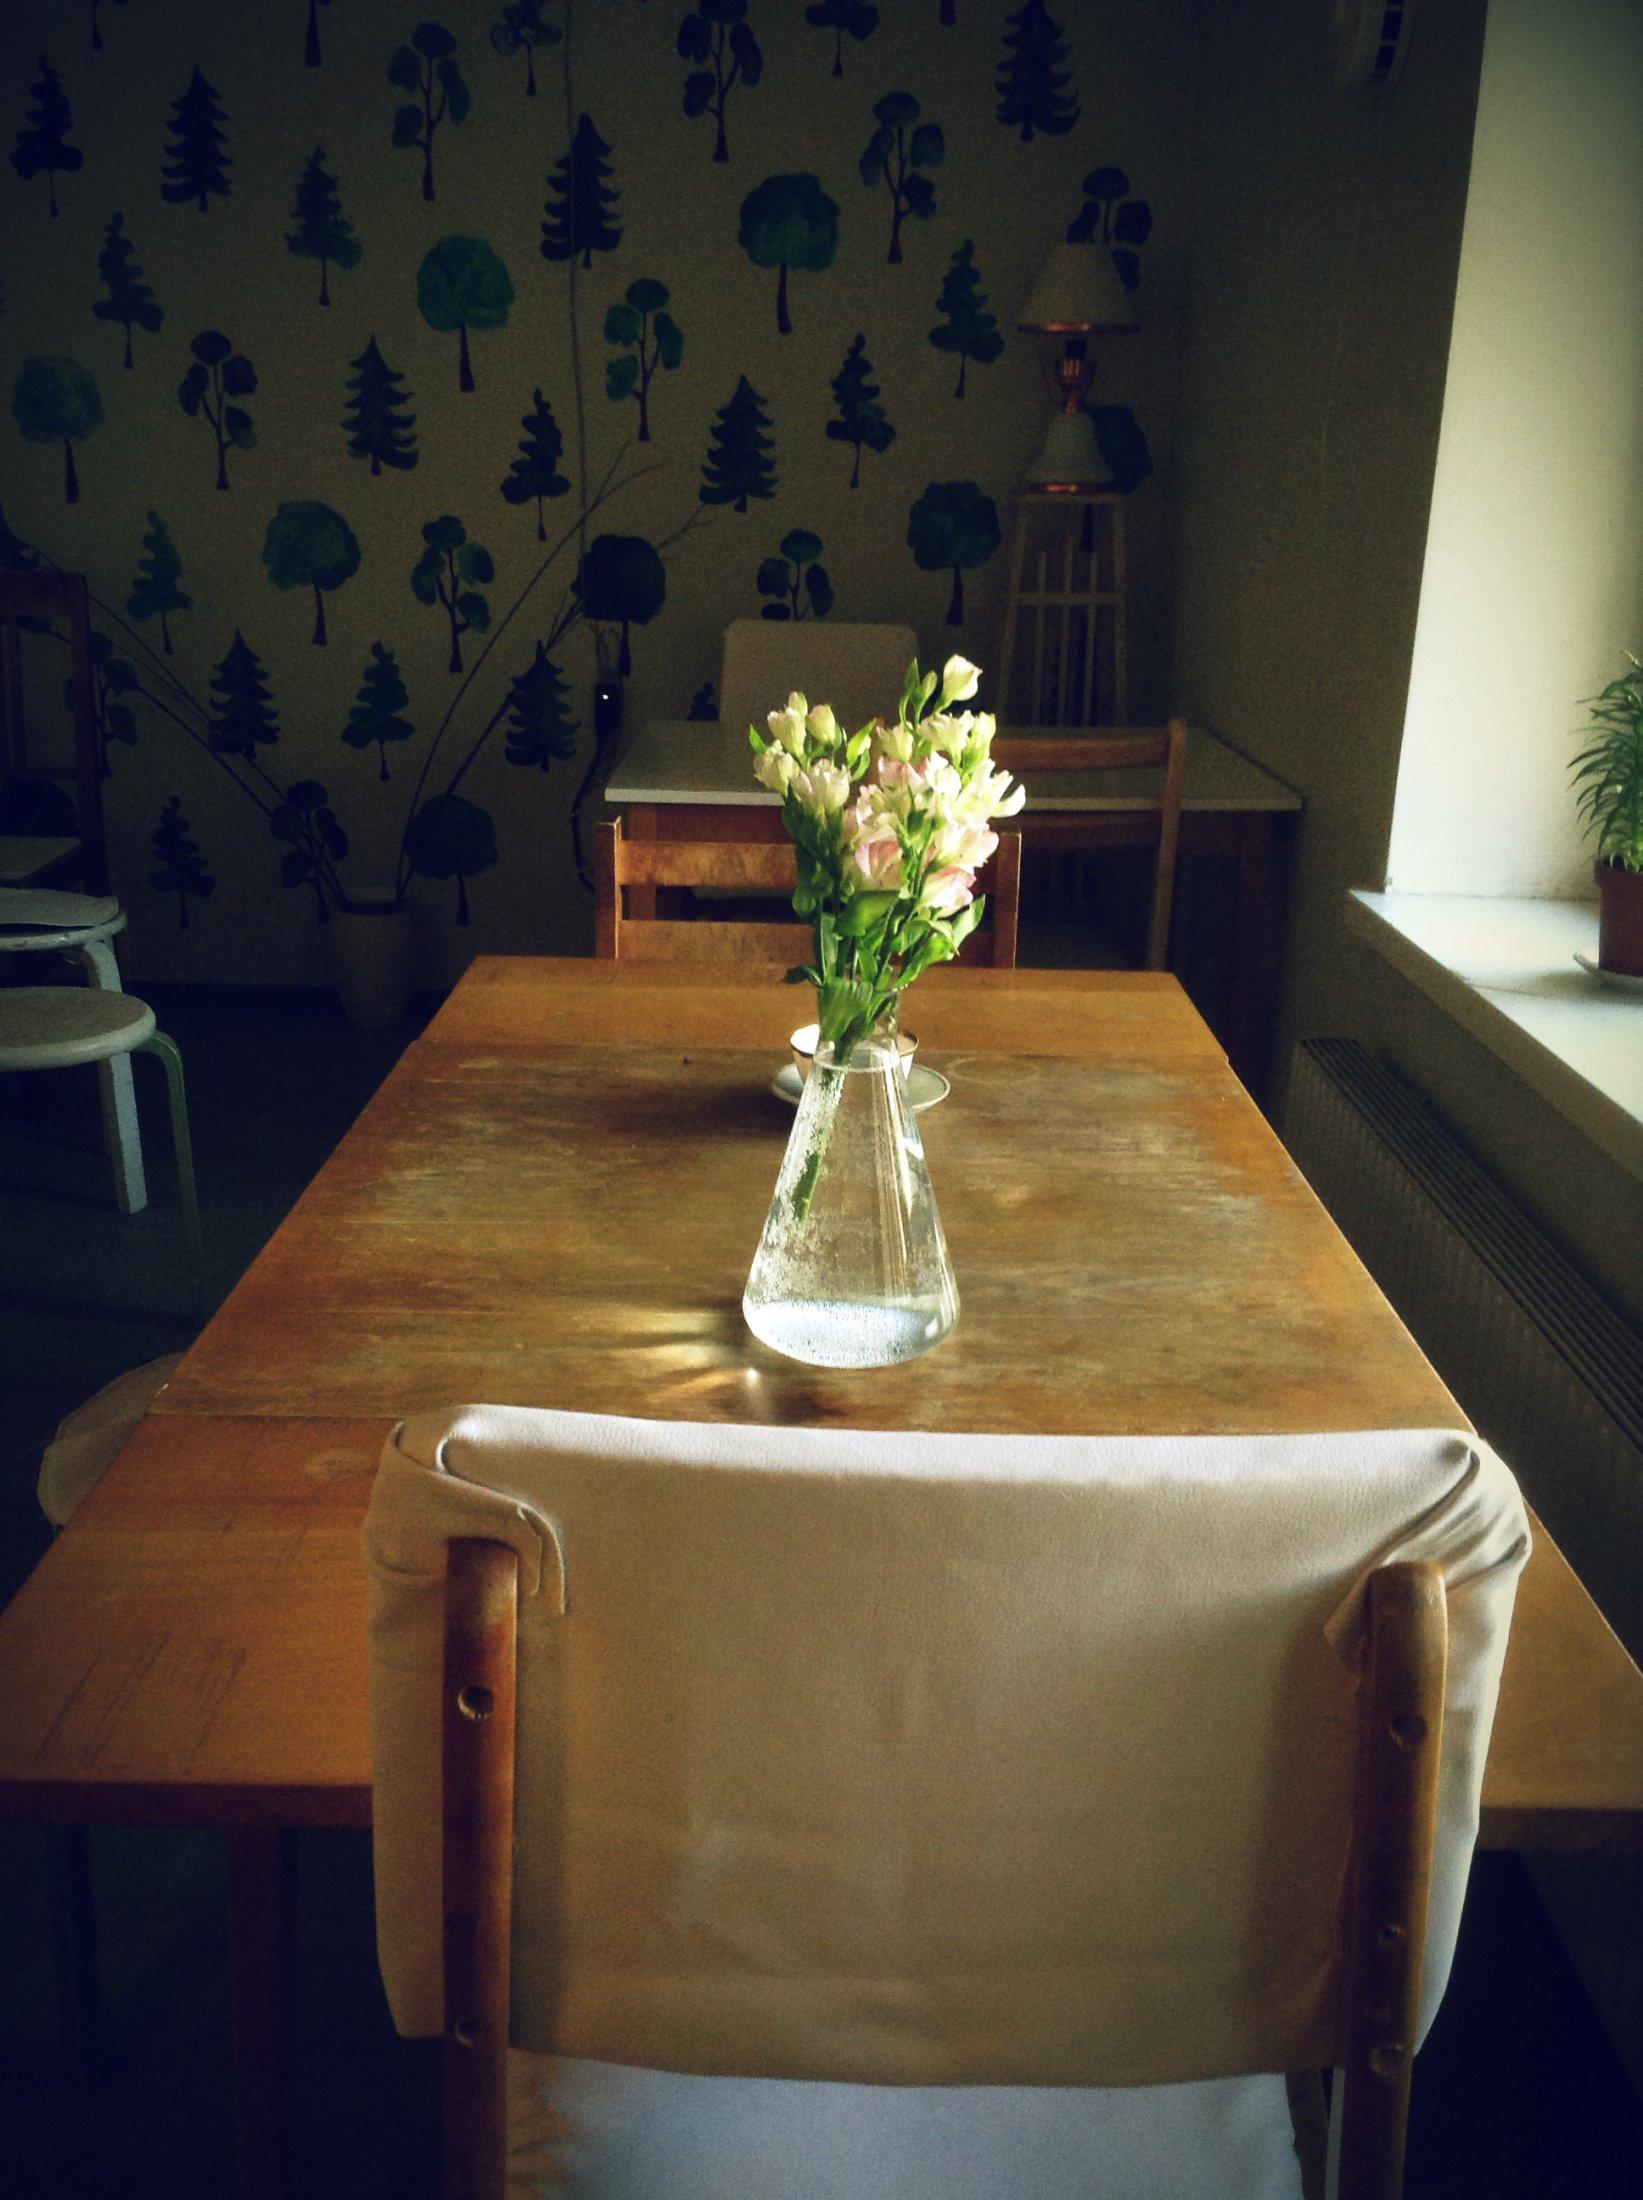 Dining Room In Looming Hostel, Tartu, Estonia